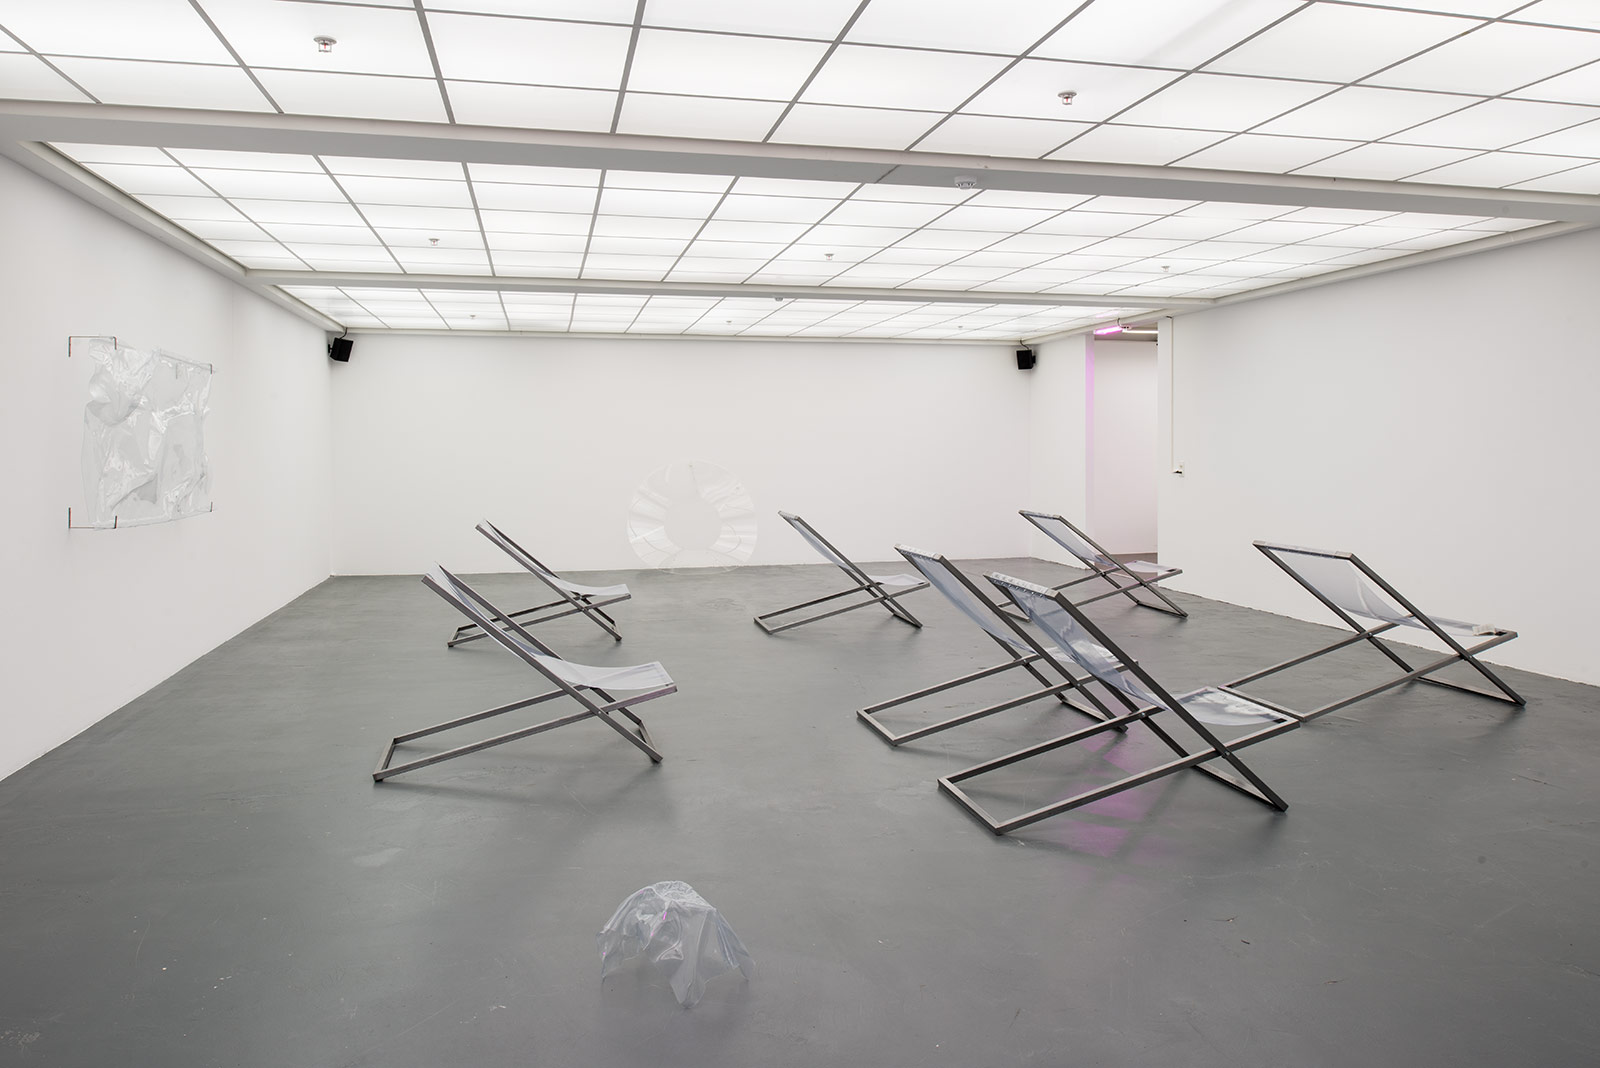 Ambra Viviani – Institut Kunst, Diplom 2017